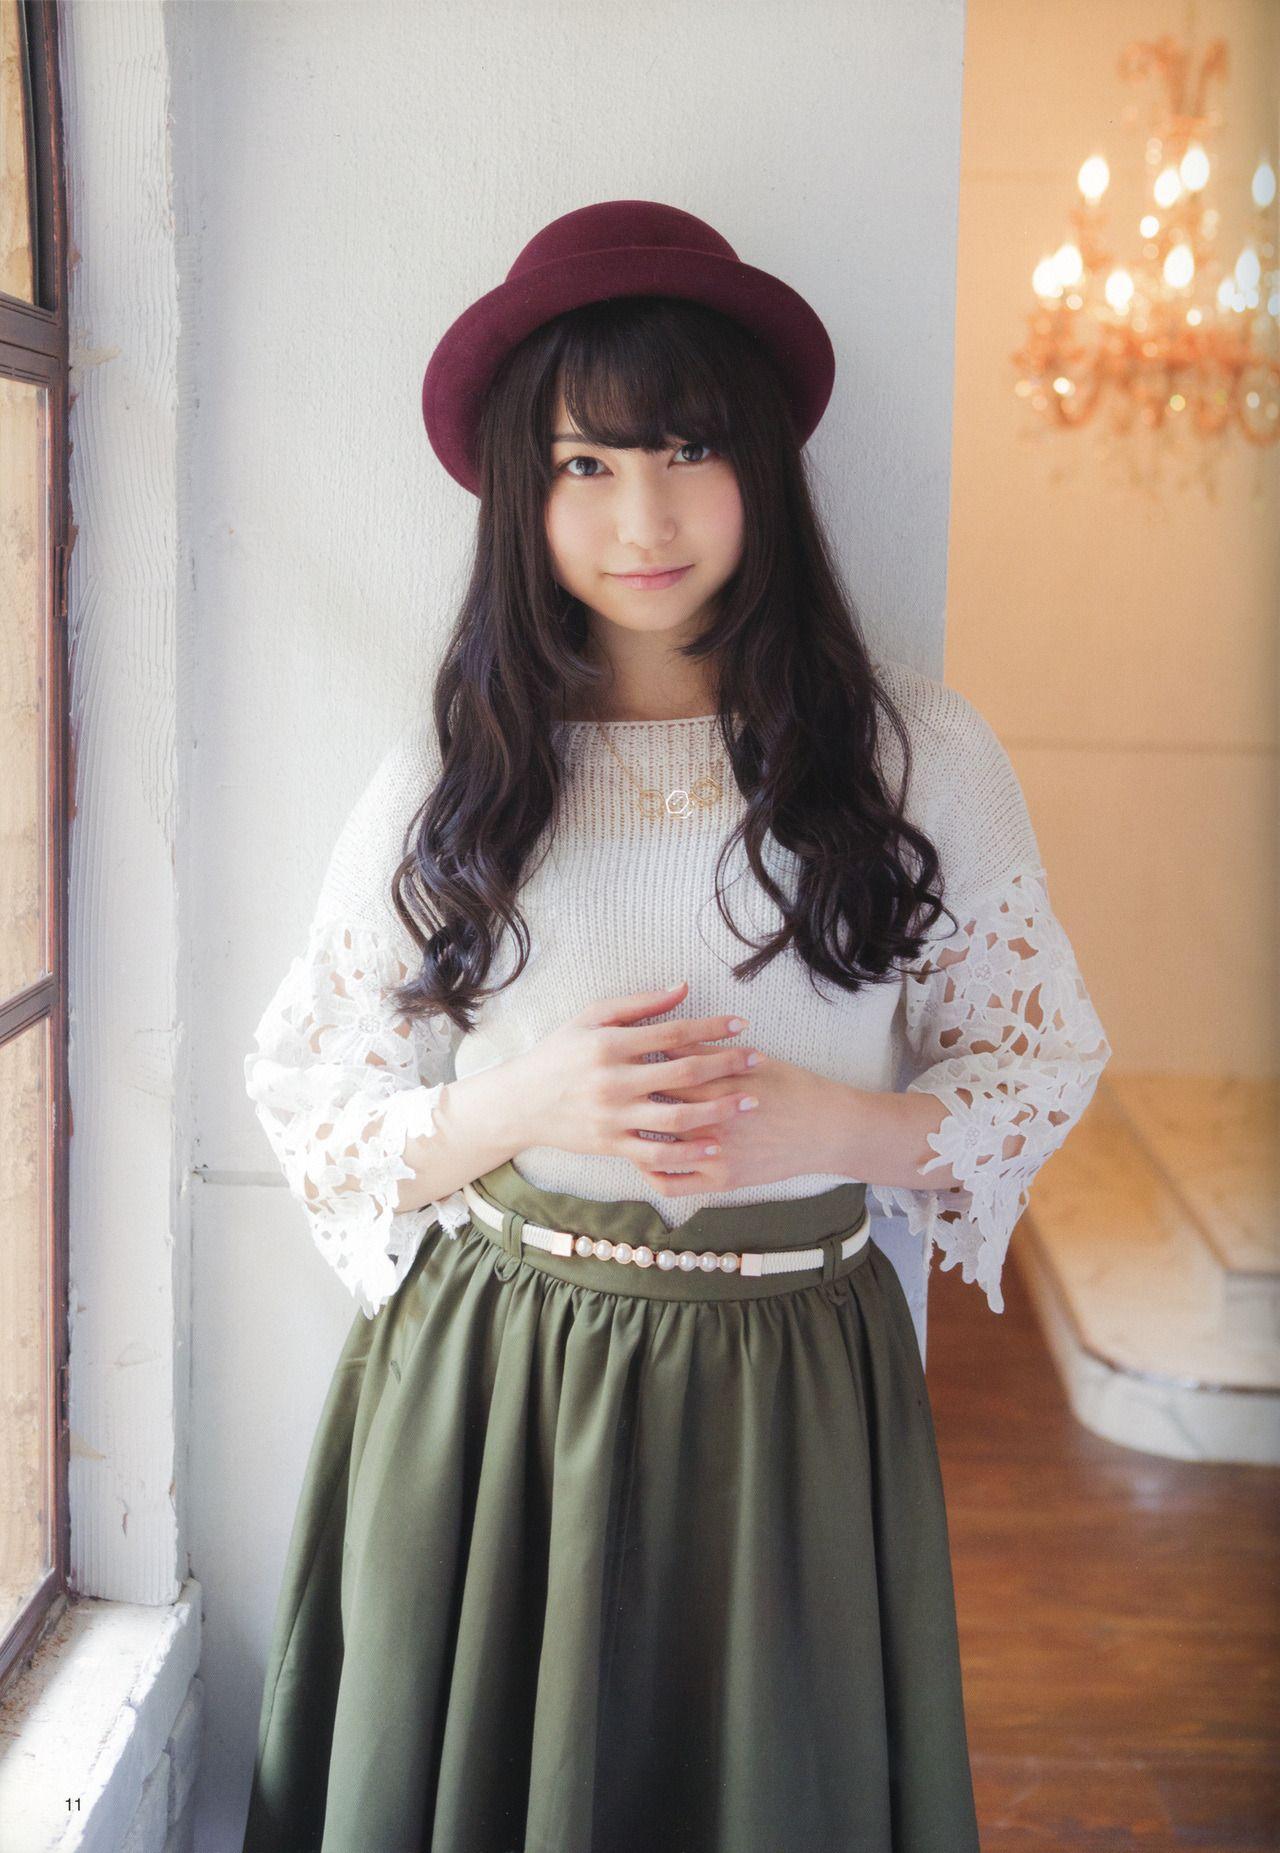 Sora Amamiya 雨宮天, カワイイ女の子, 女の子